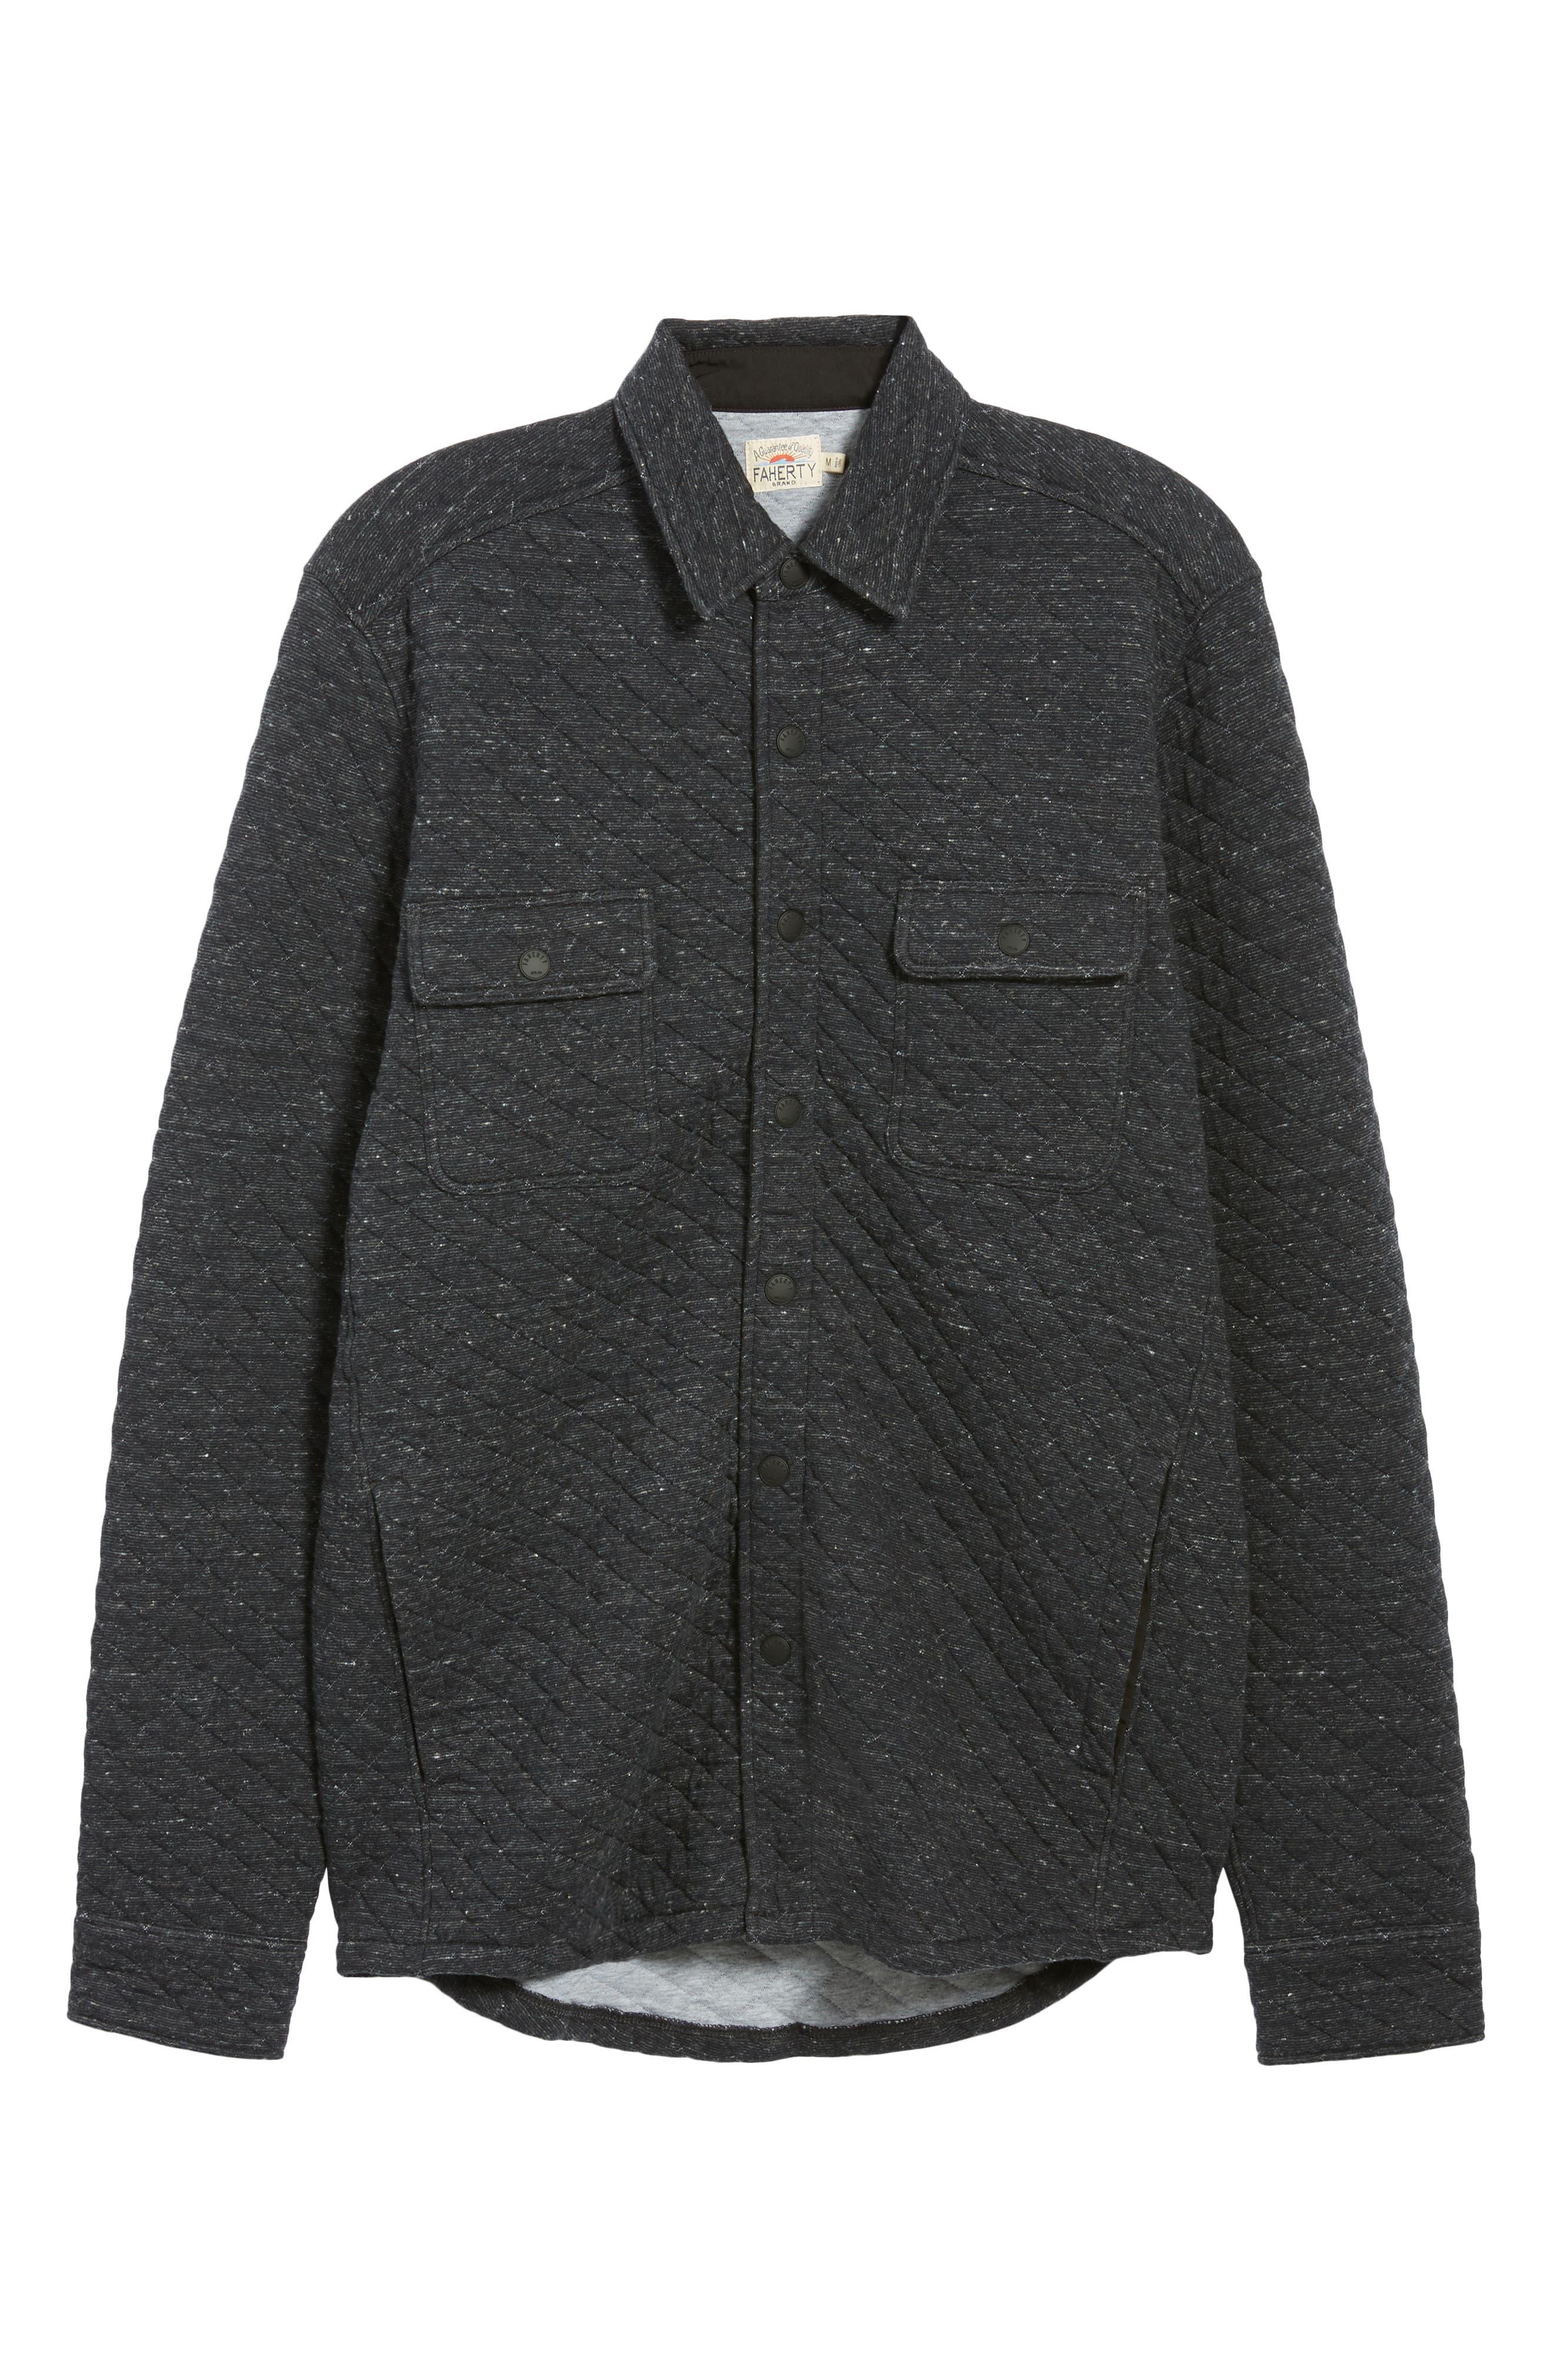 FAHERTY,                             Belmar Regular Fit Quilted Shirt Jacket,                             Alternate thumbnail 5, color,                             BLACK HEATHER